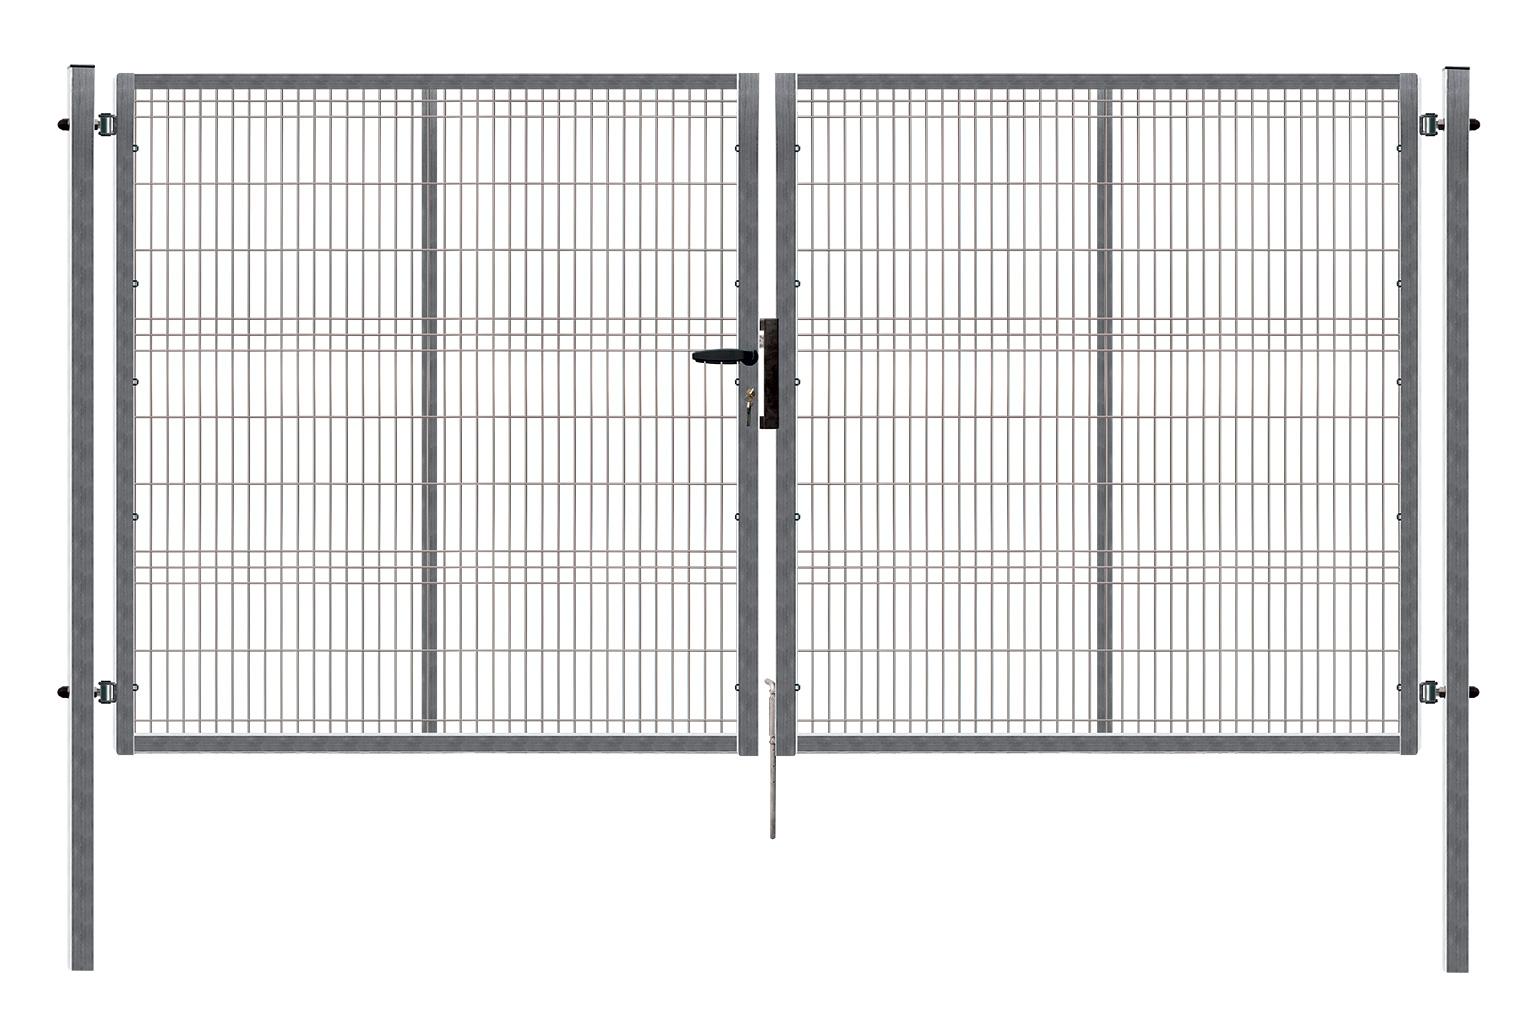 Brána PILOFOR dvoukřídlá, 4118x1045 mm, Zn 40,2Kg